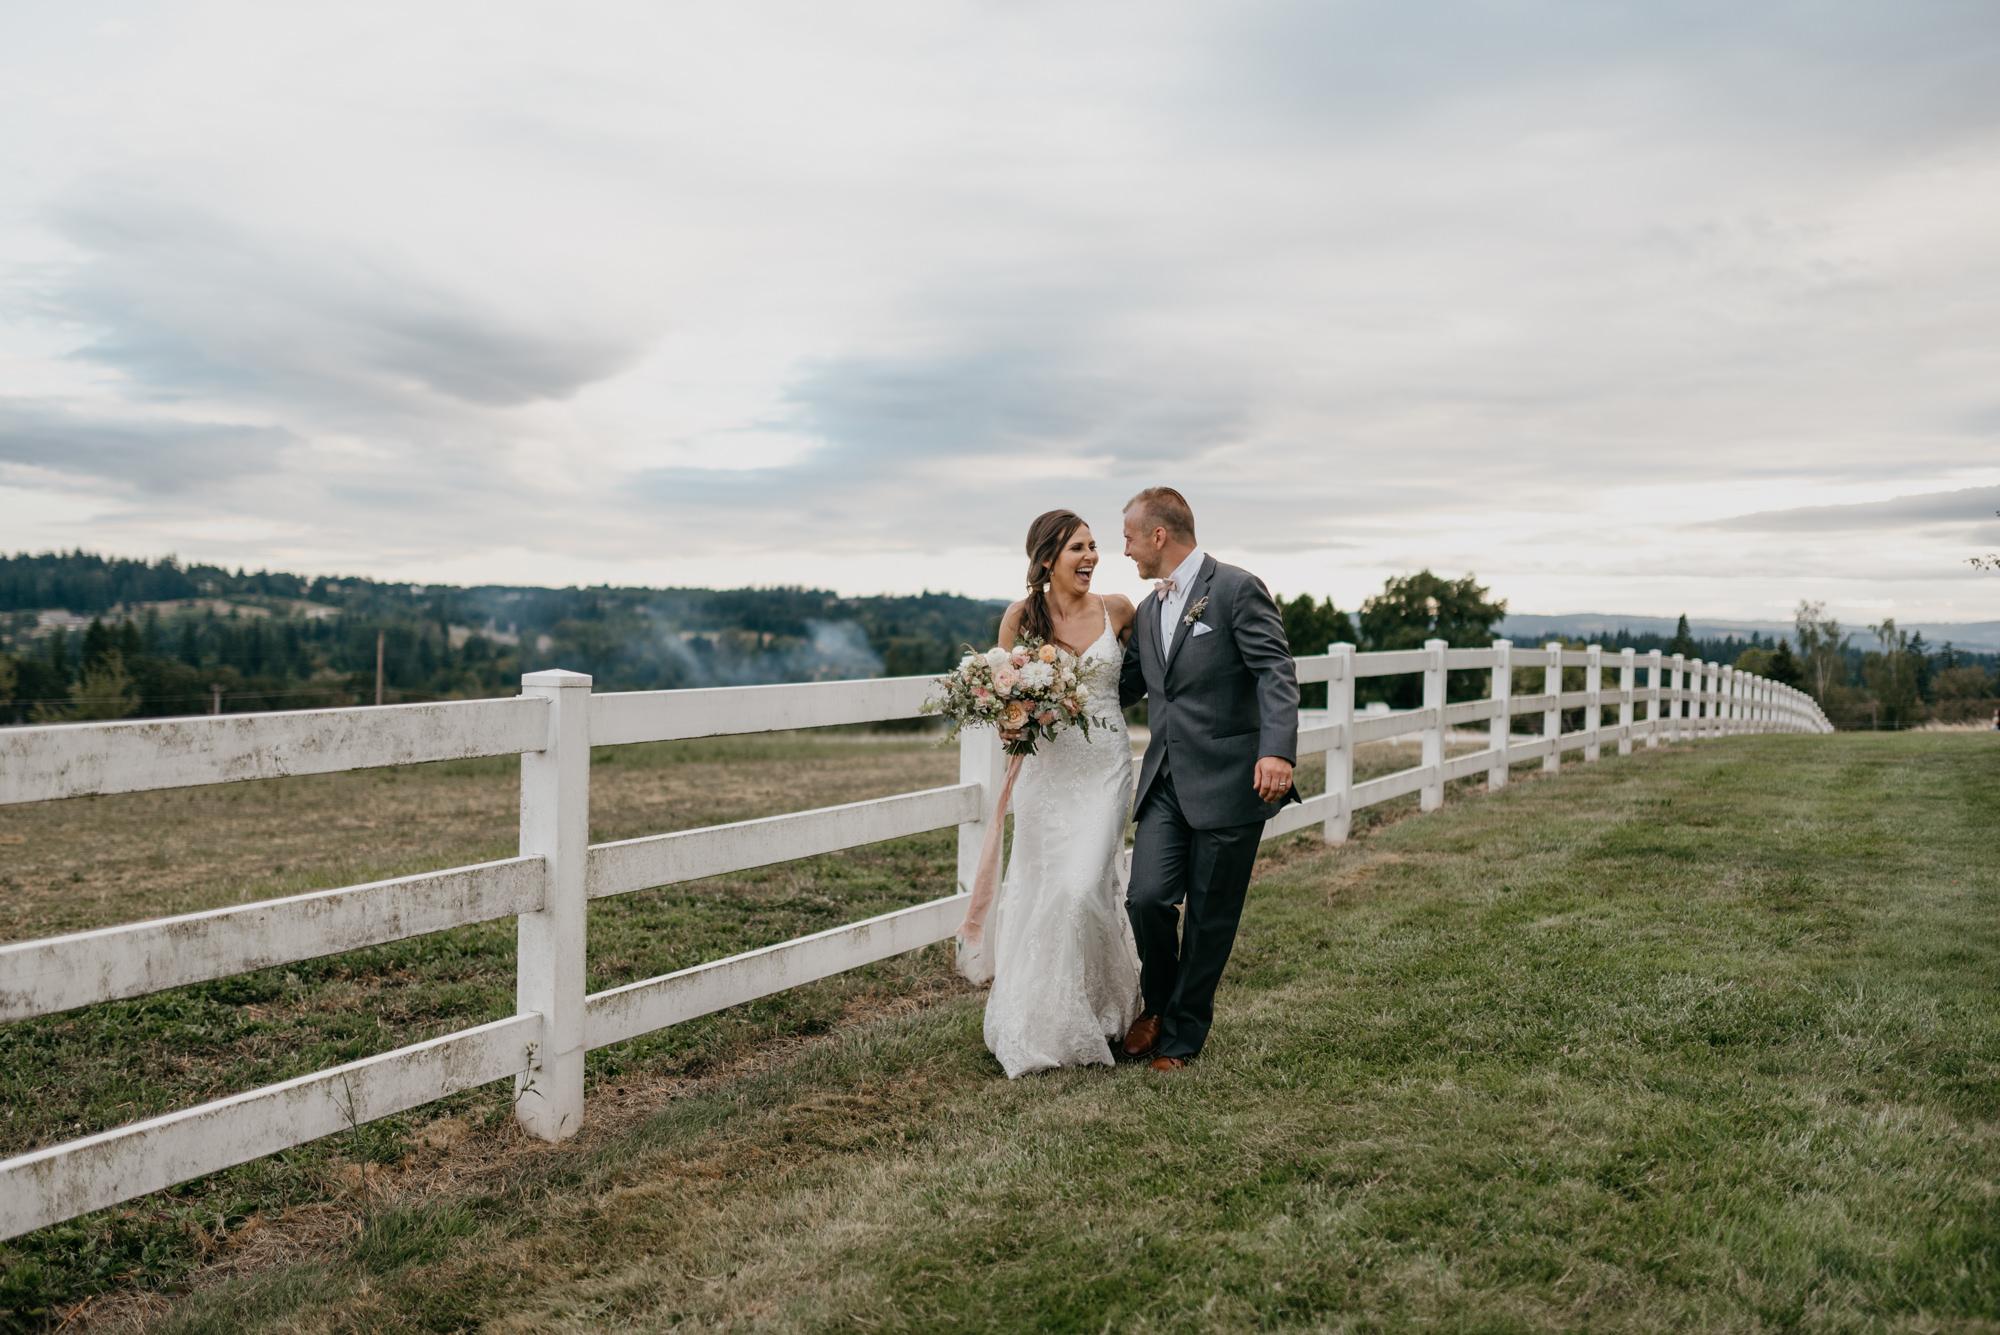 171-barn-kestrel-portland-northwest-horse-sunset-wedding.jpg